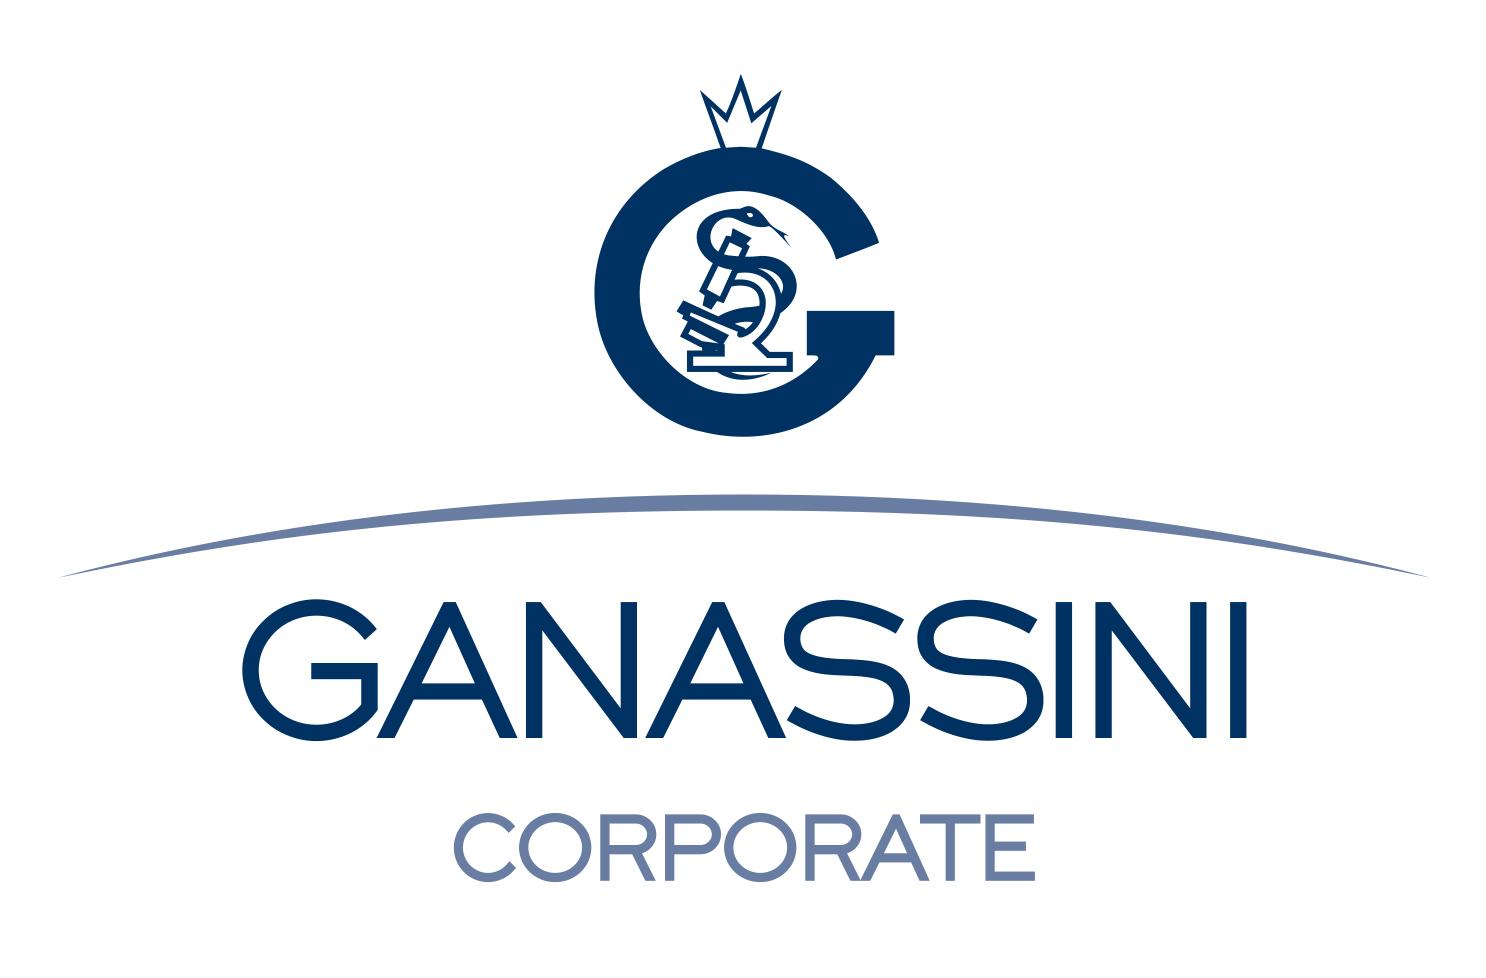 Ganassini_Corporate_pos_neg